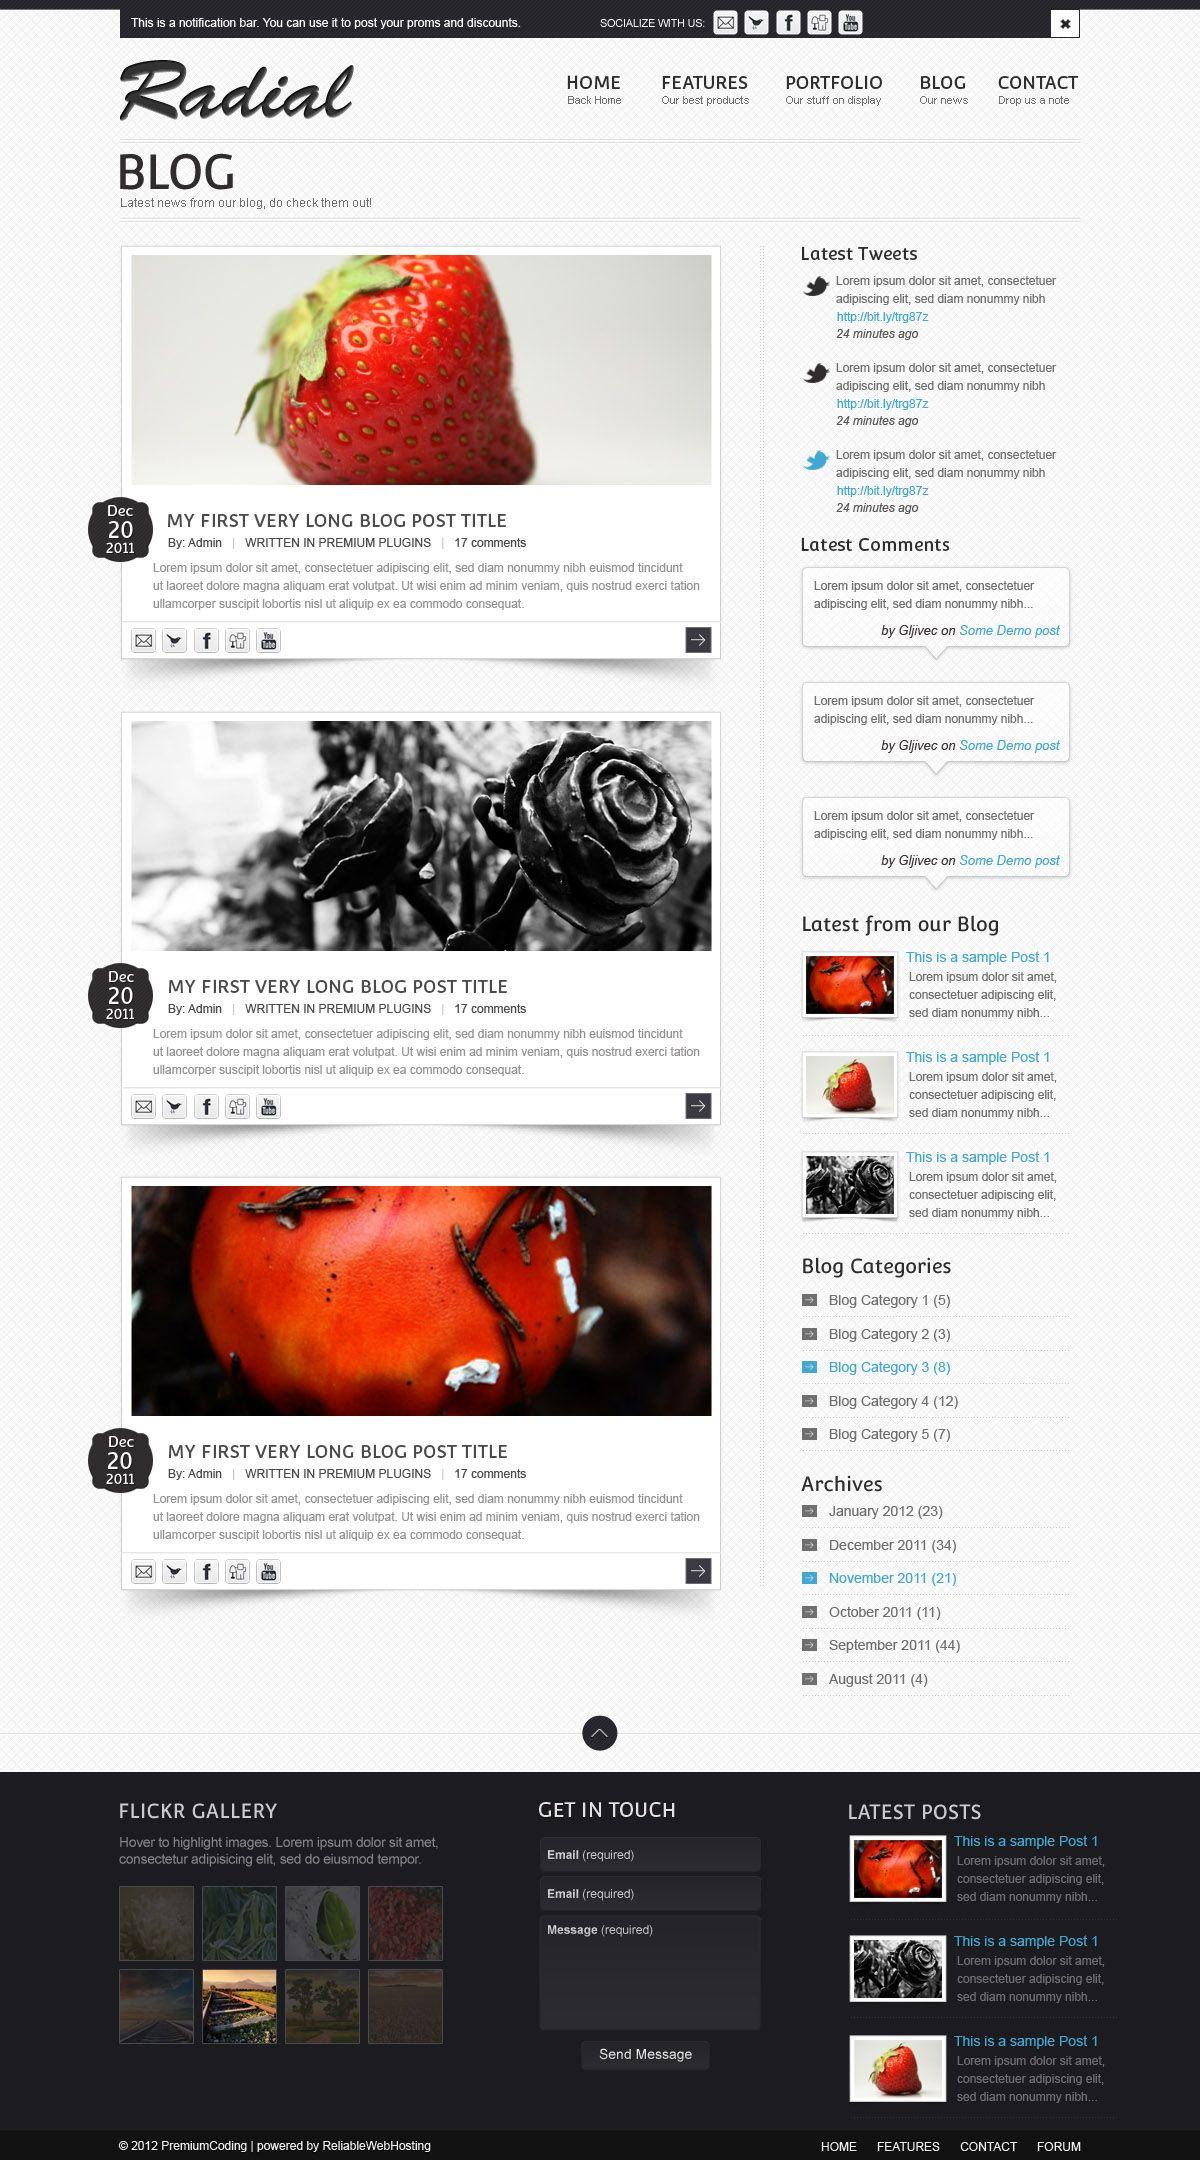 freebie radial blog site template psd digitalt design